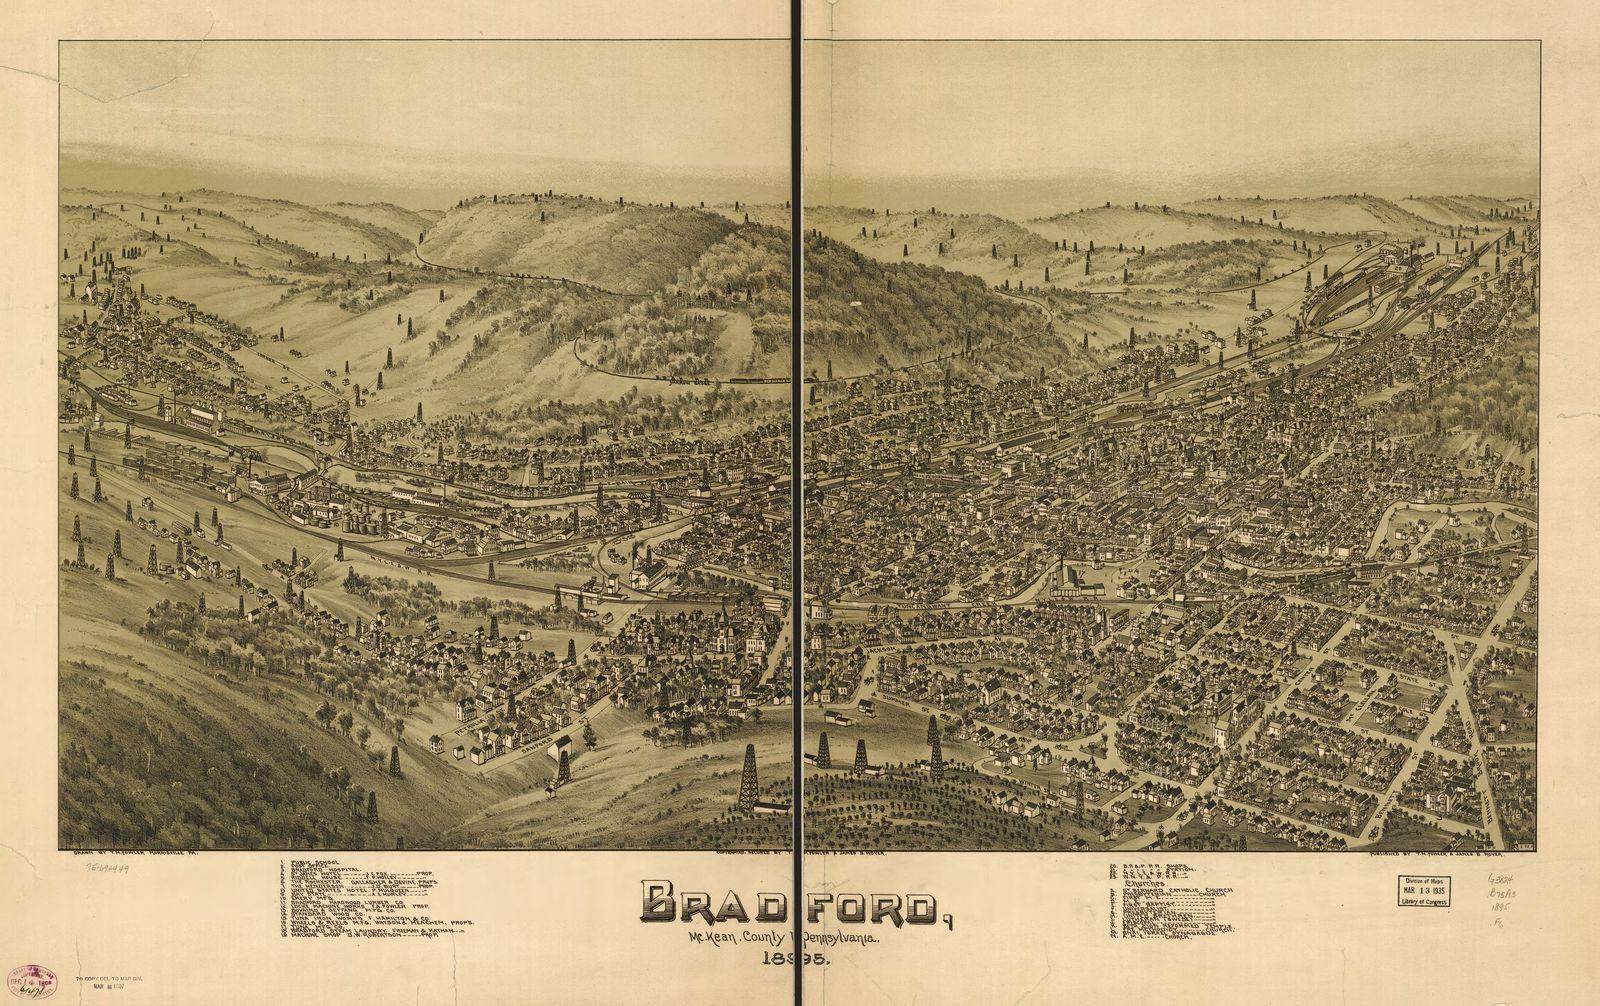 Bradford, McKean County, Pennsylvania, 1895.